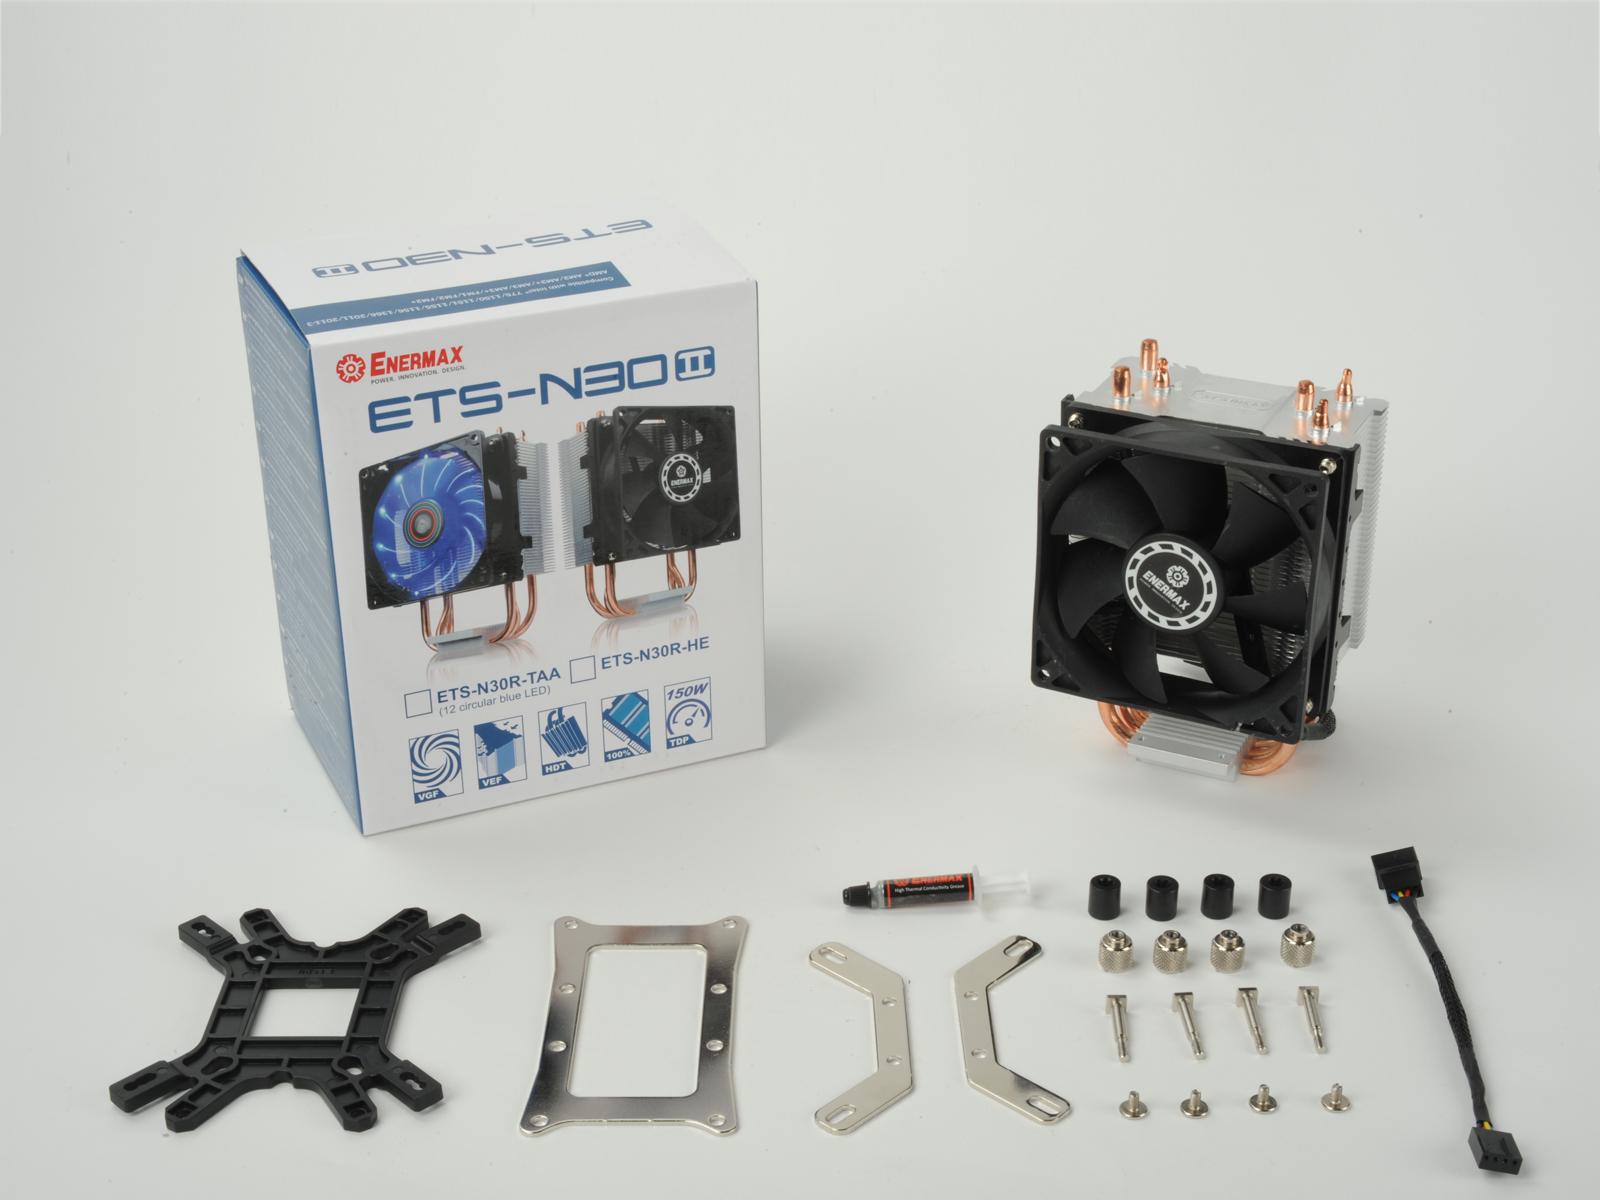 HSF ENERMAX ETS-N30R-HE / ETSN30RHE NO-LED